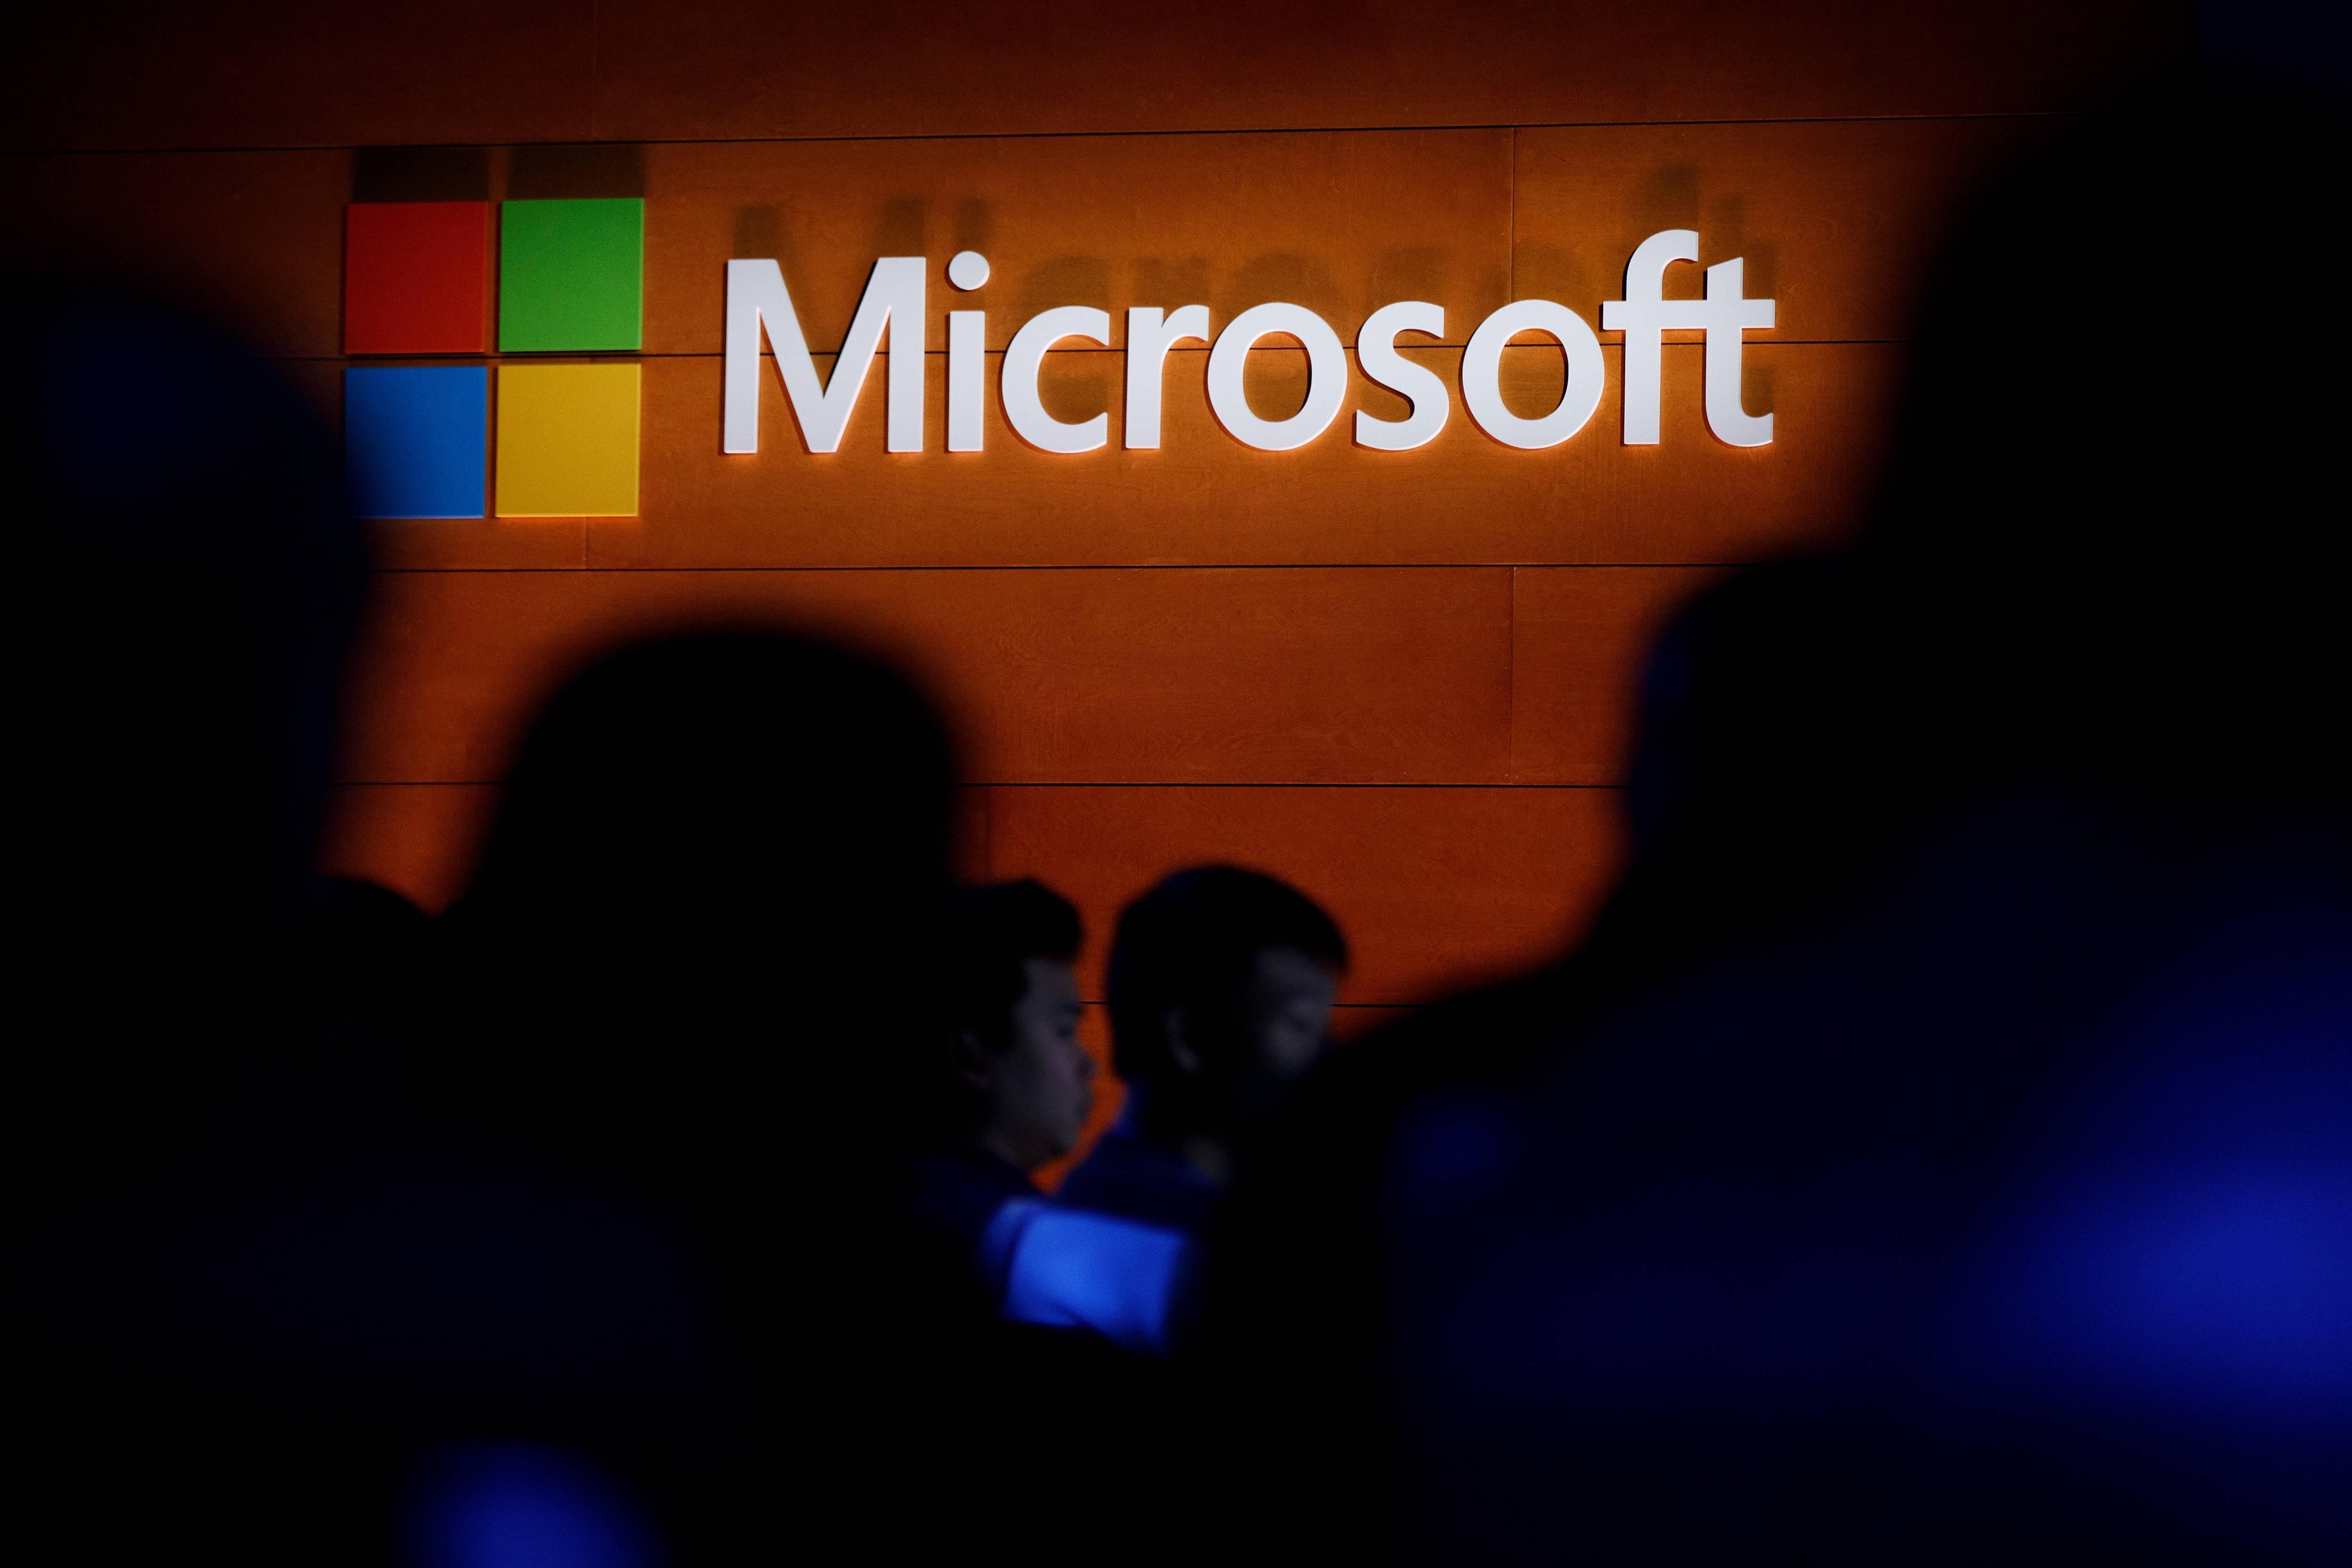 Rusia anunció que eliminará Windows de sus computadores militares